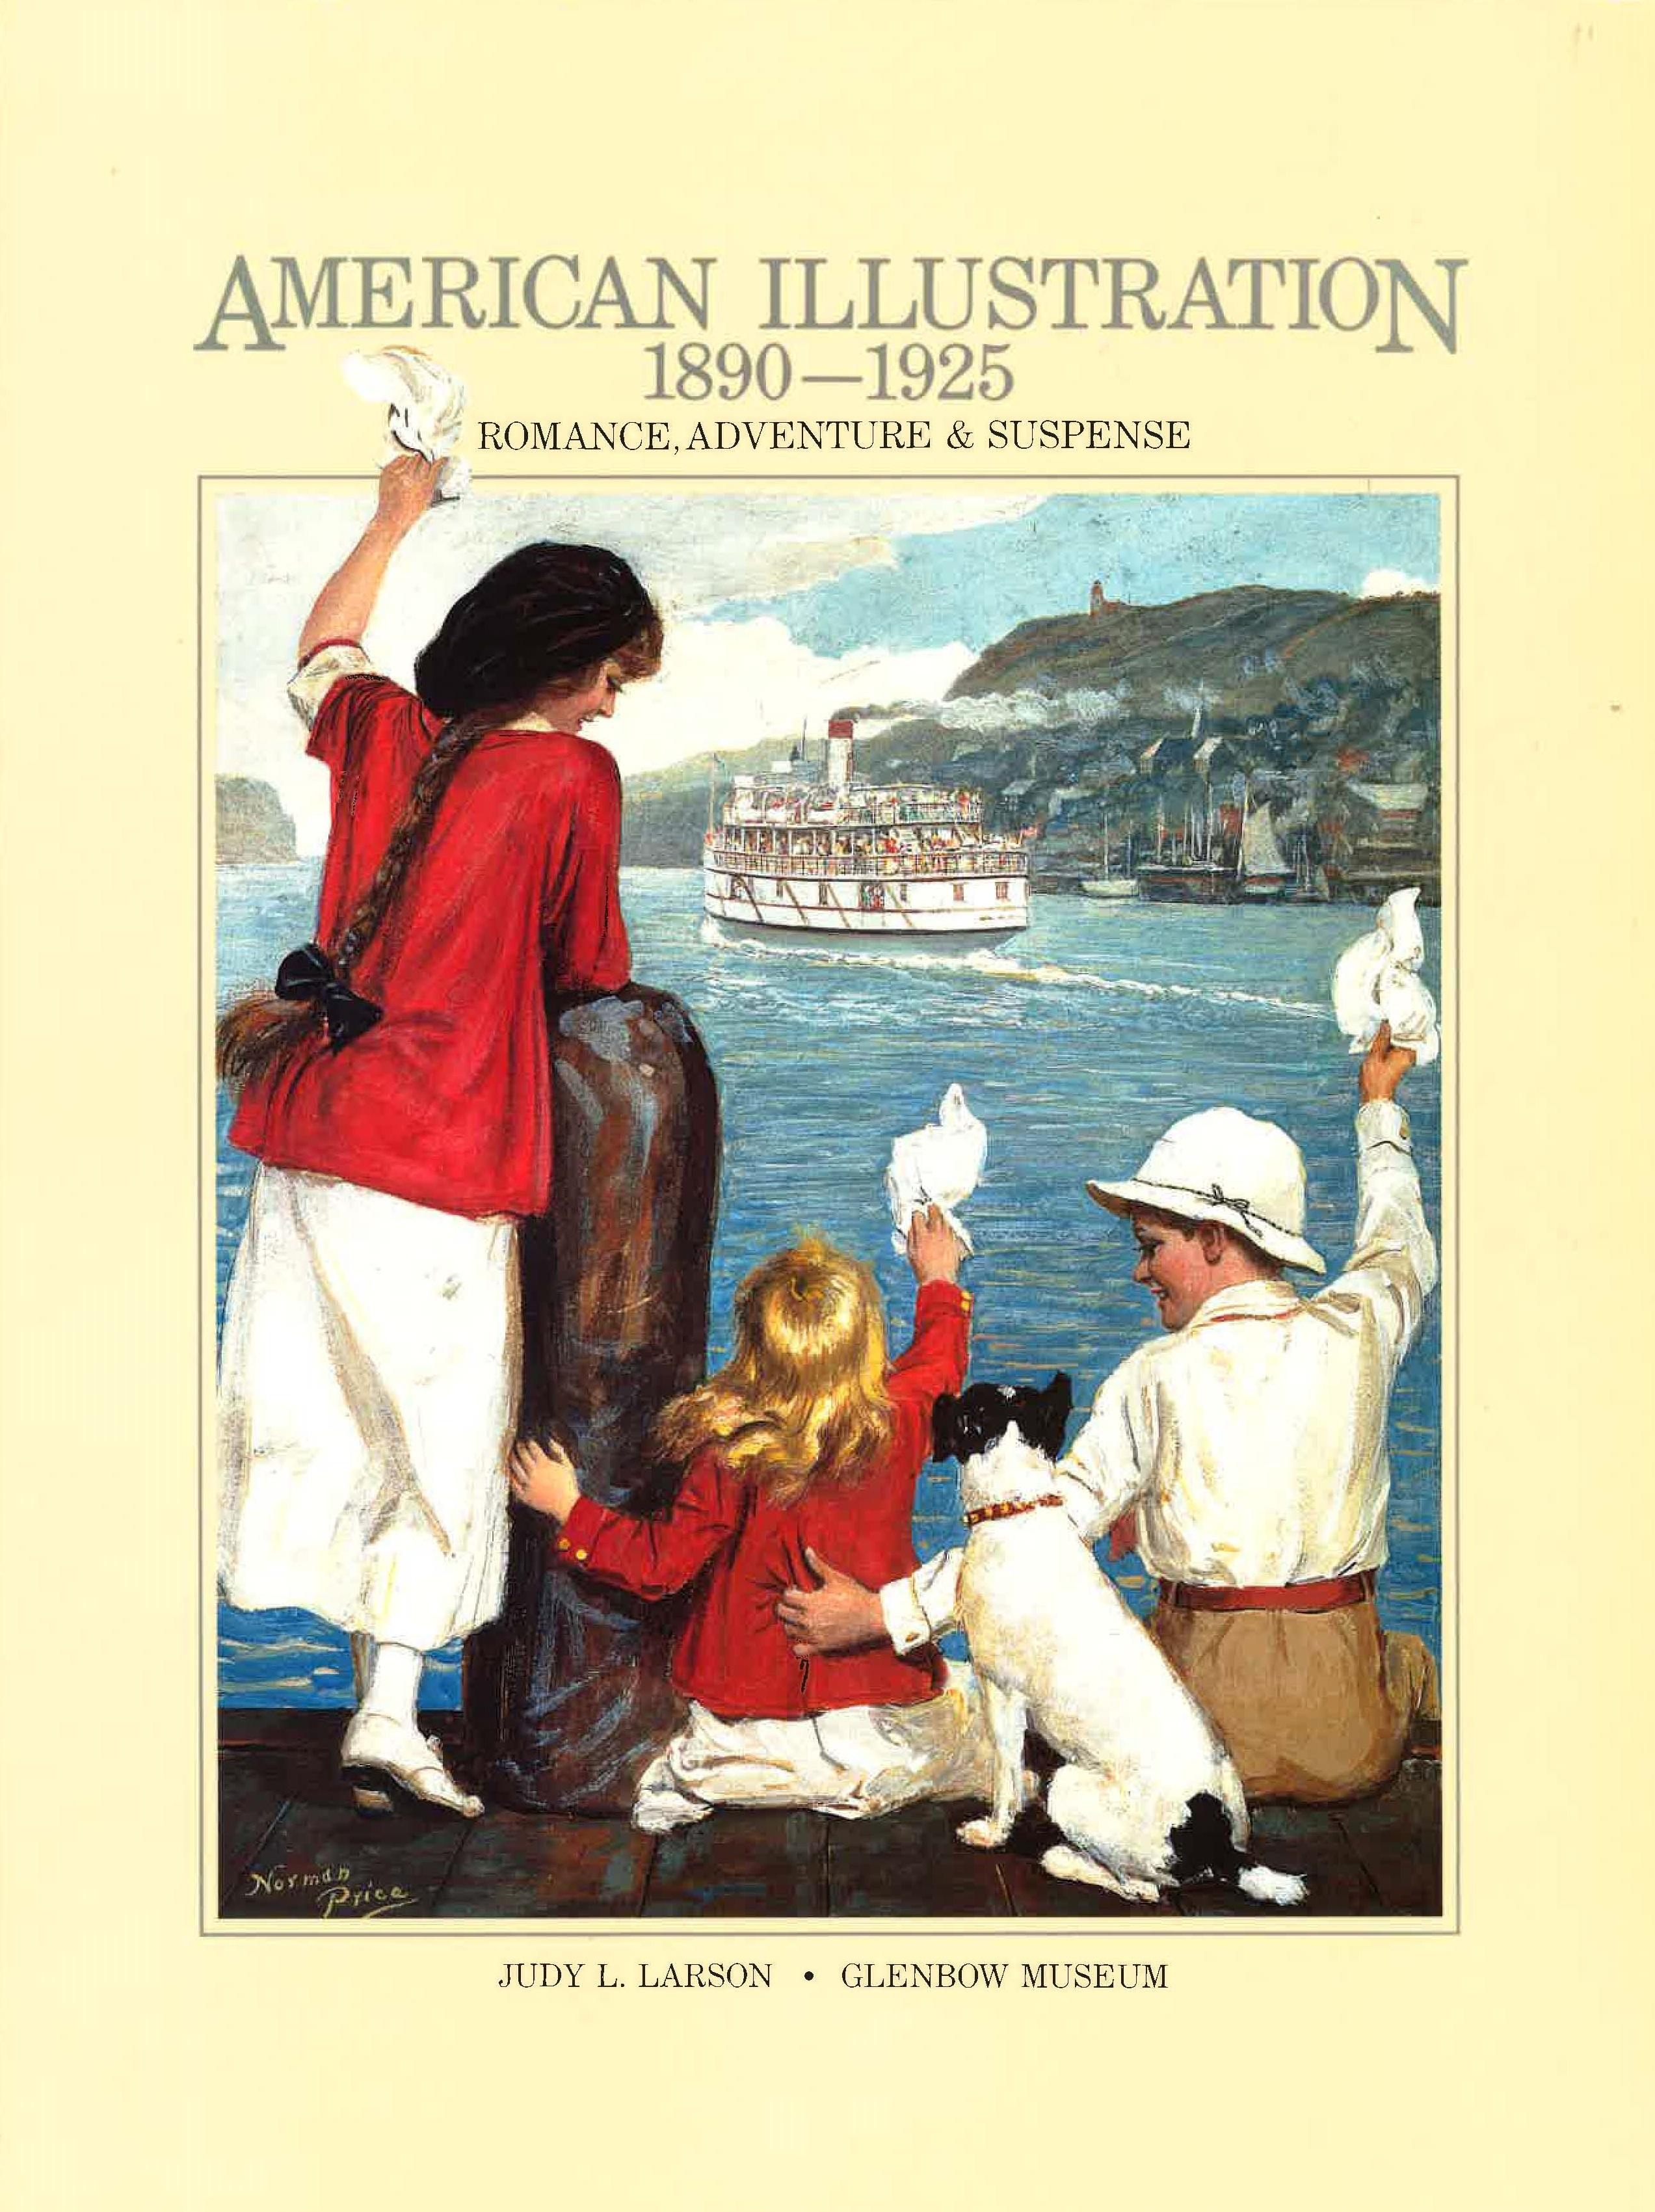 American Illustration, 1890-1925: Romance, Adventure & Suspense